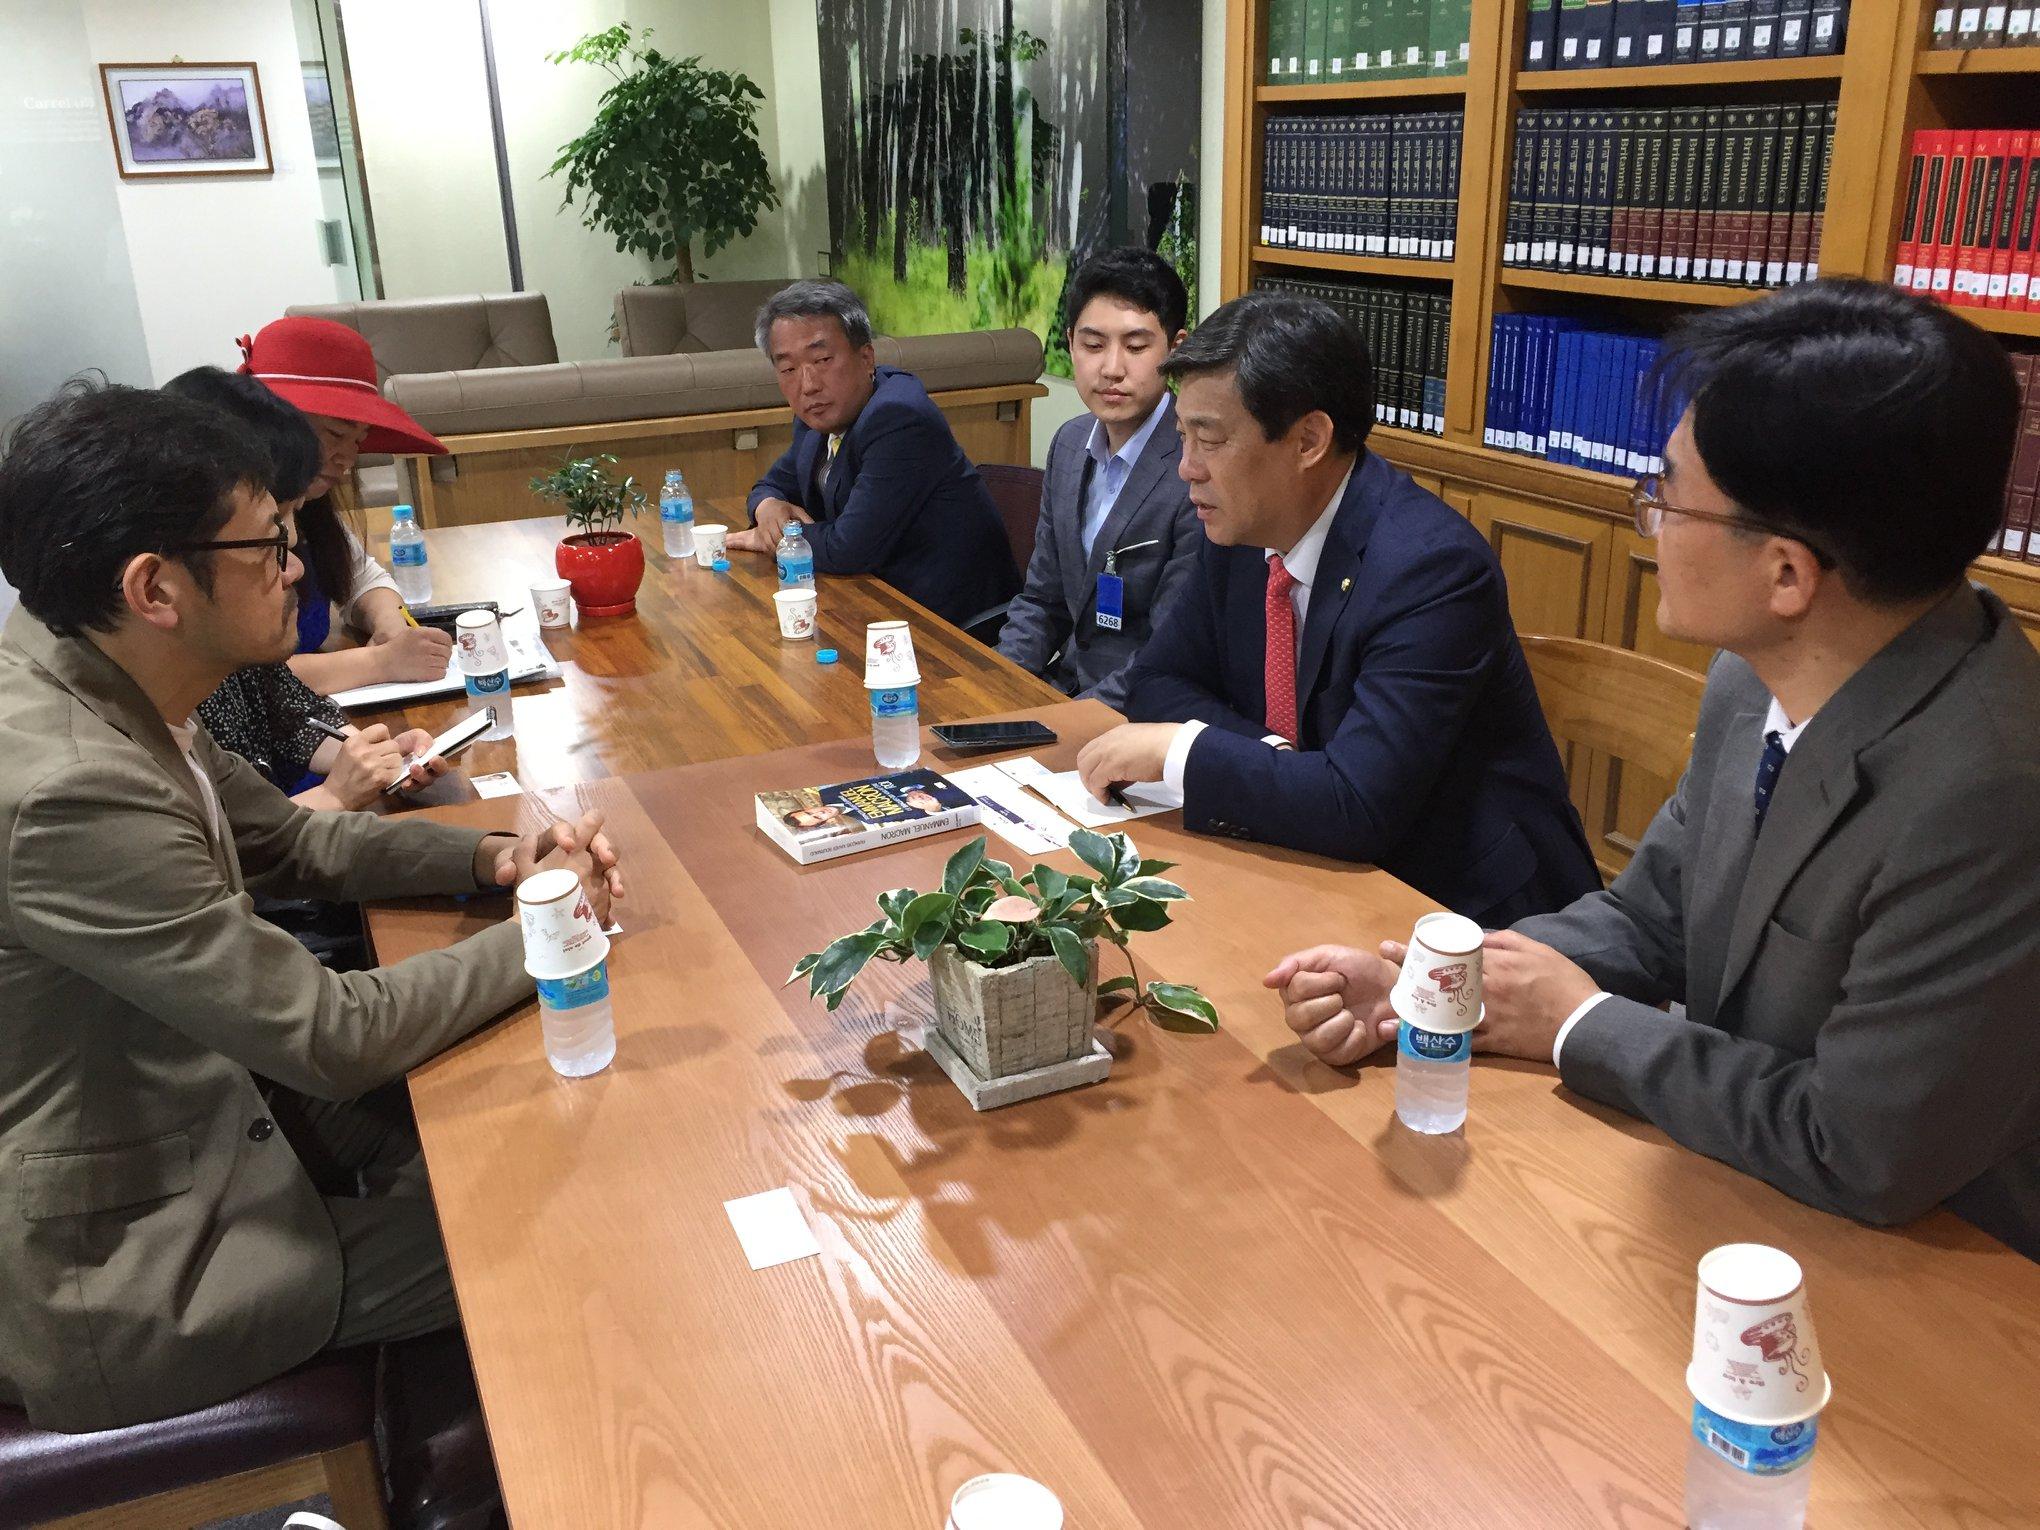 韓国国会議員会館内での会談風景